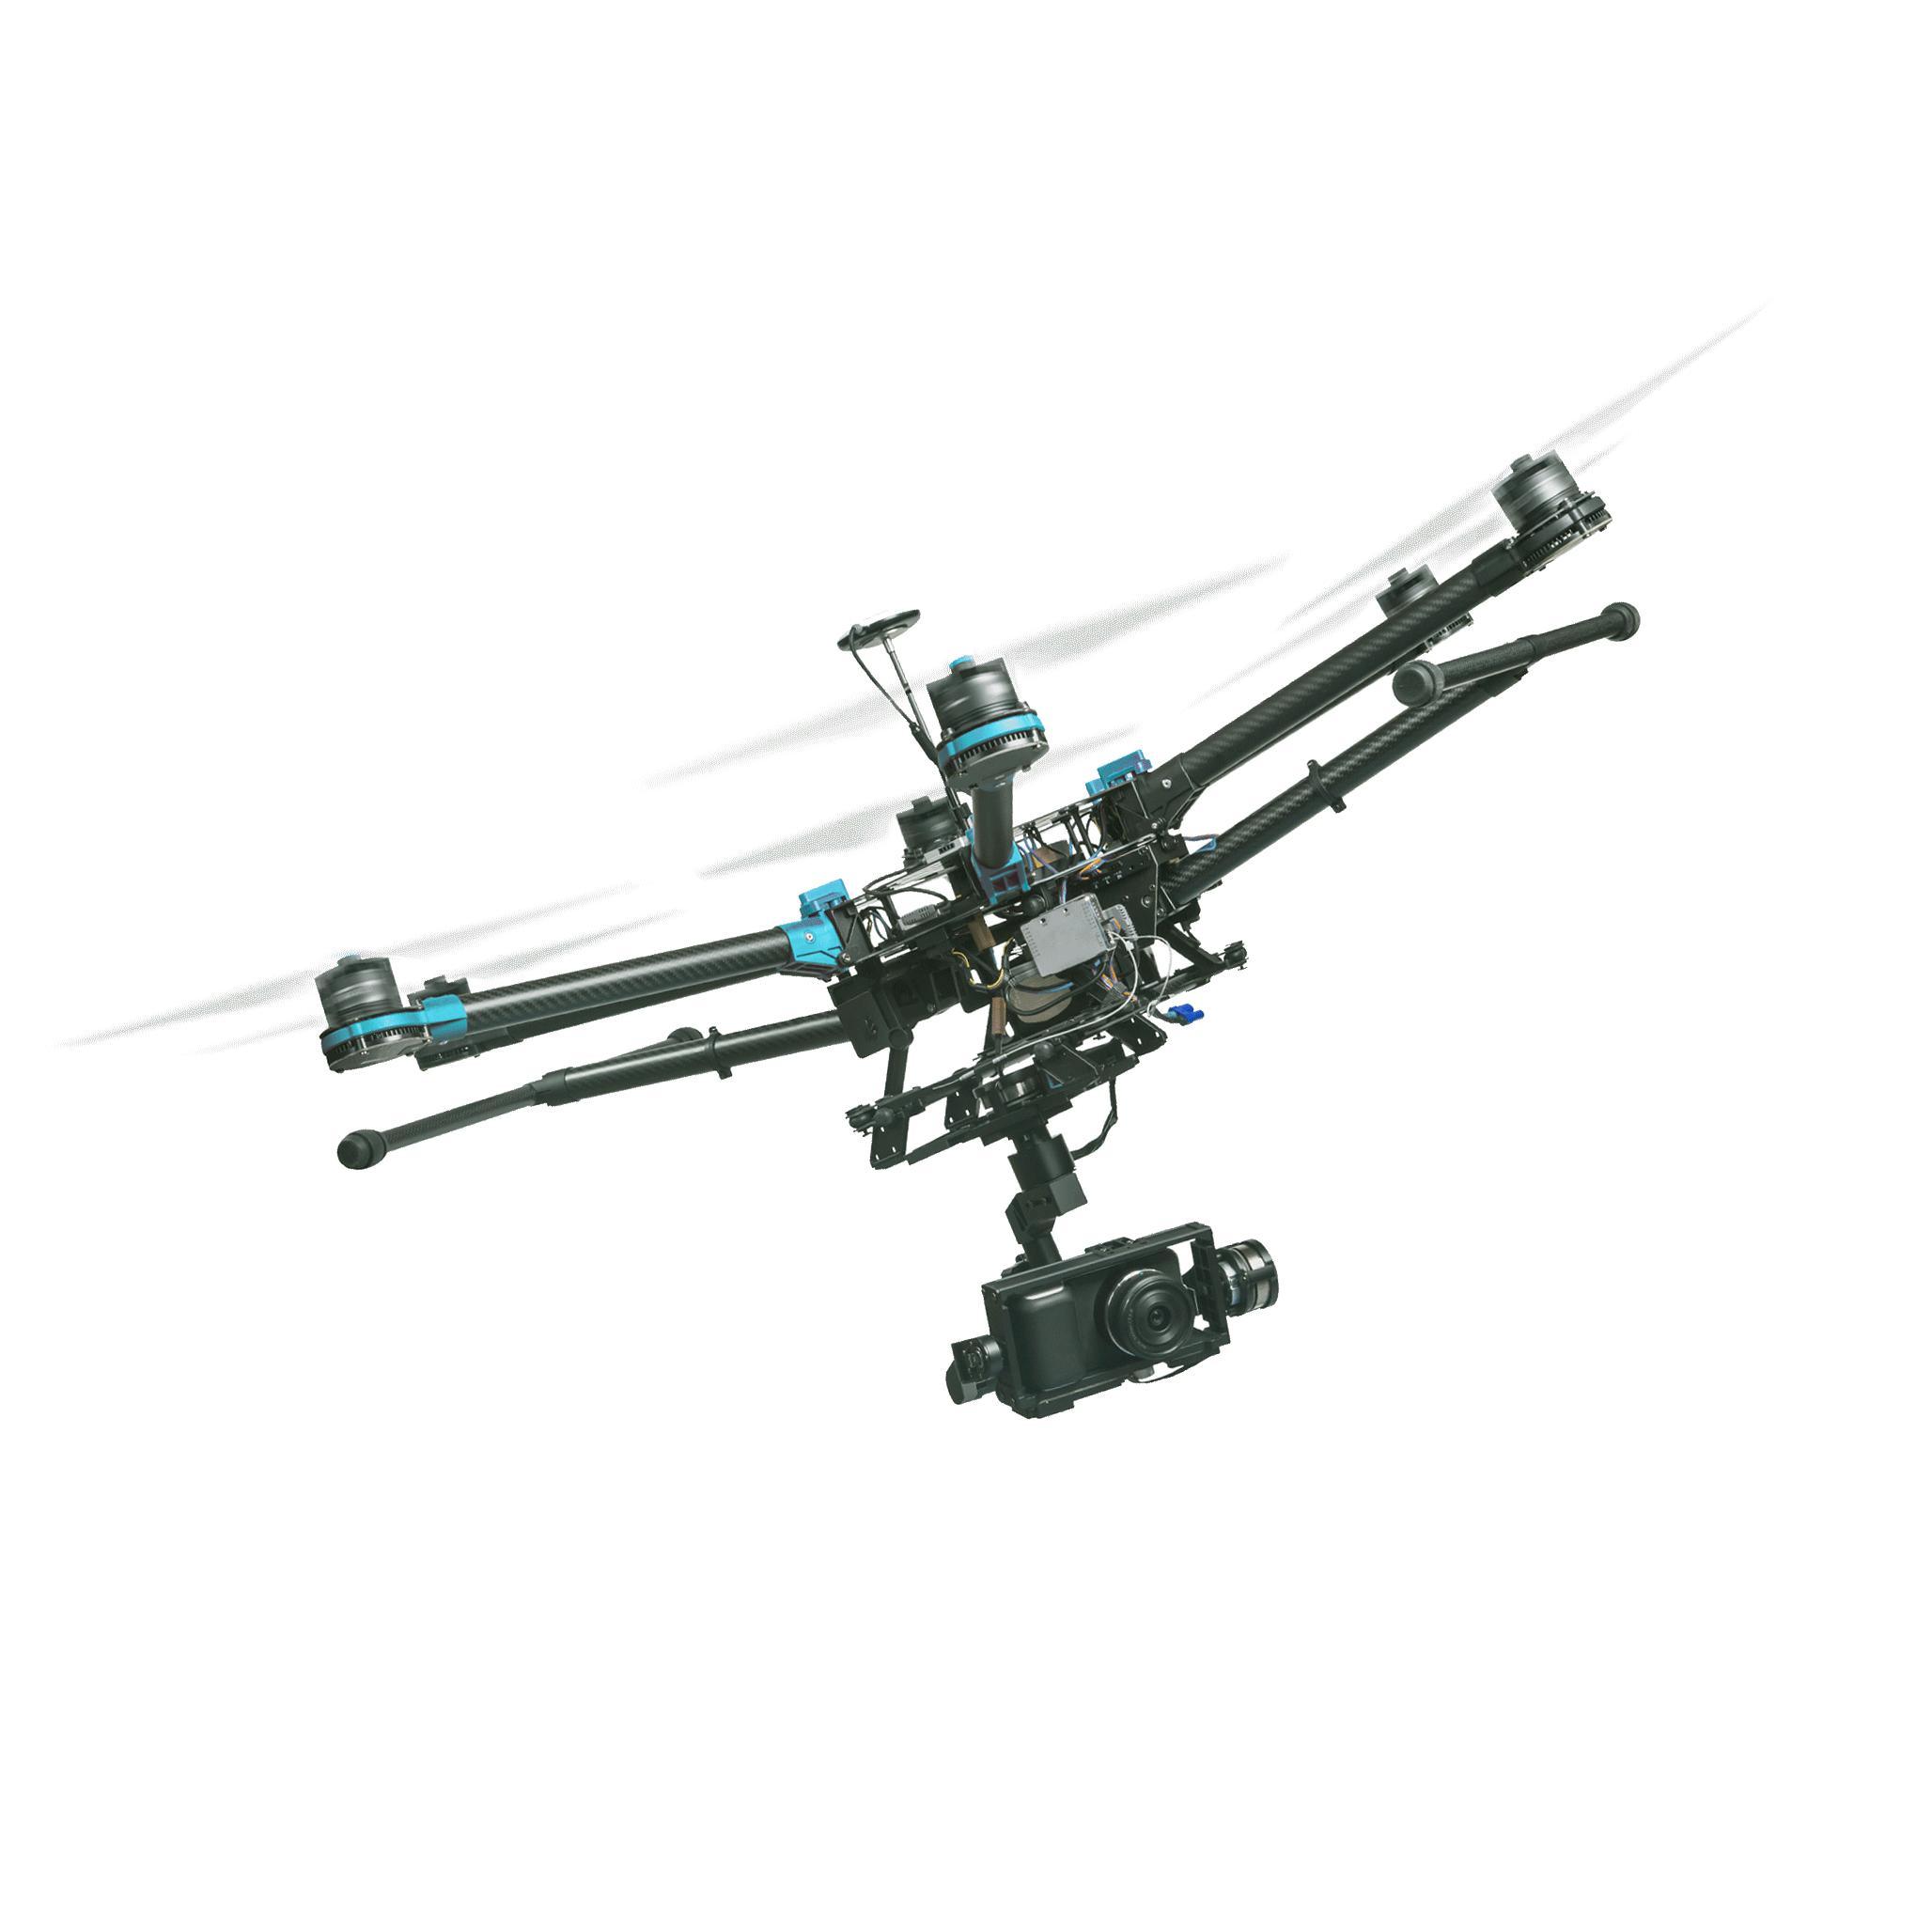 Drone PNG Picture SVG Clip arts